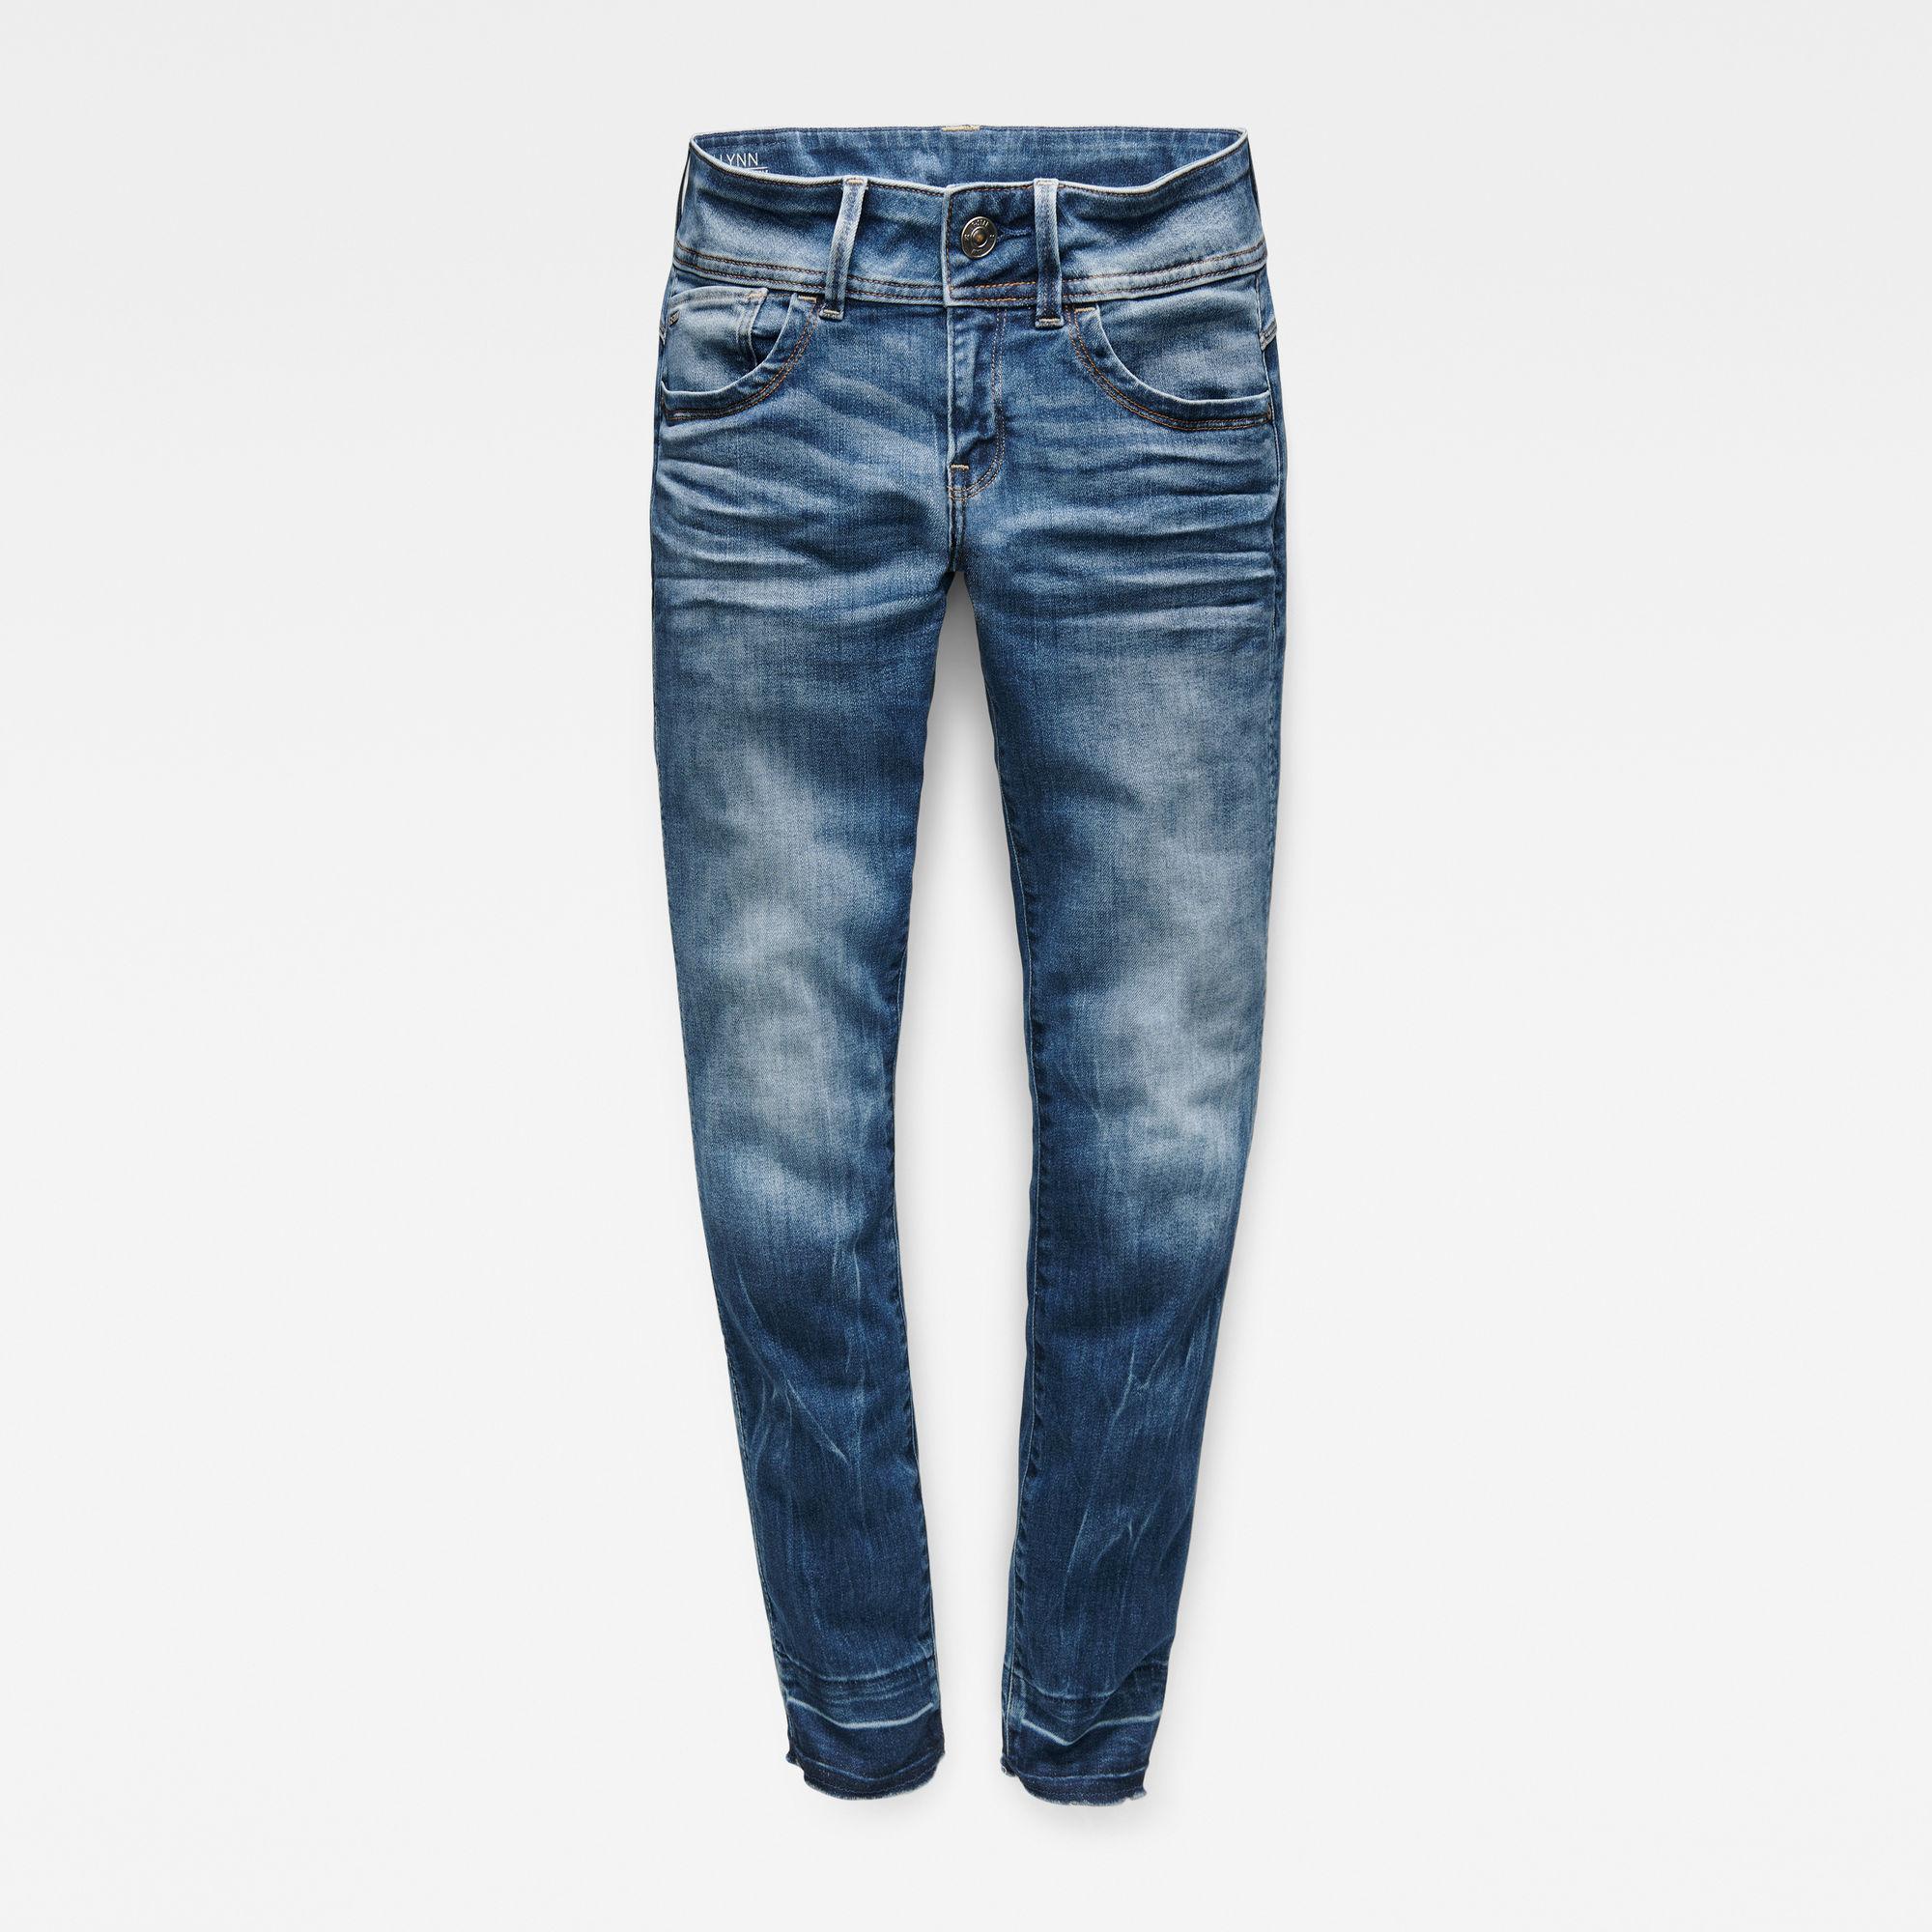 Lynn Mid Waist Skinny RP Ankle Jeans